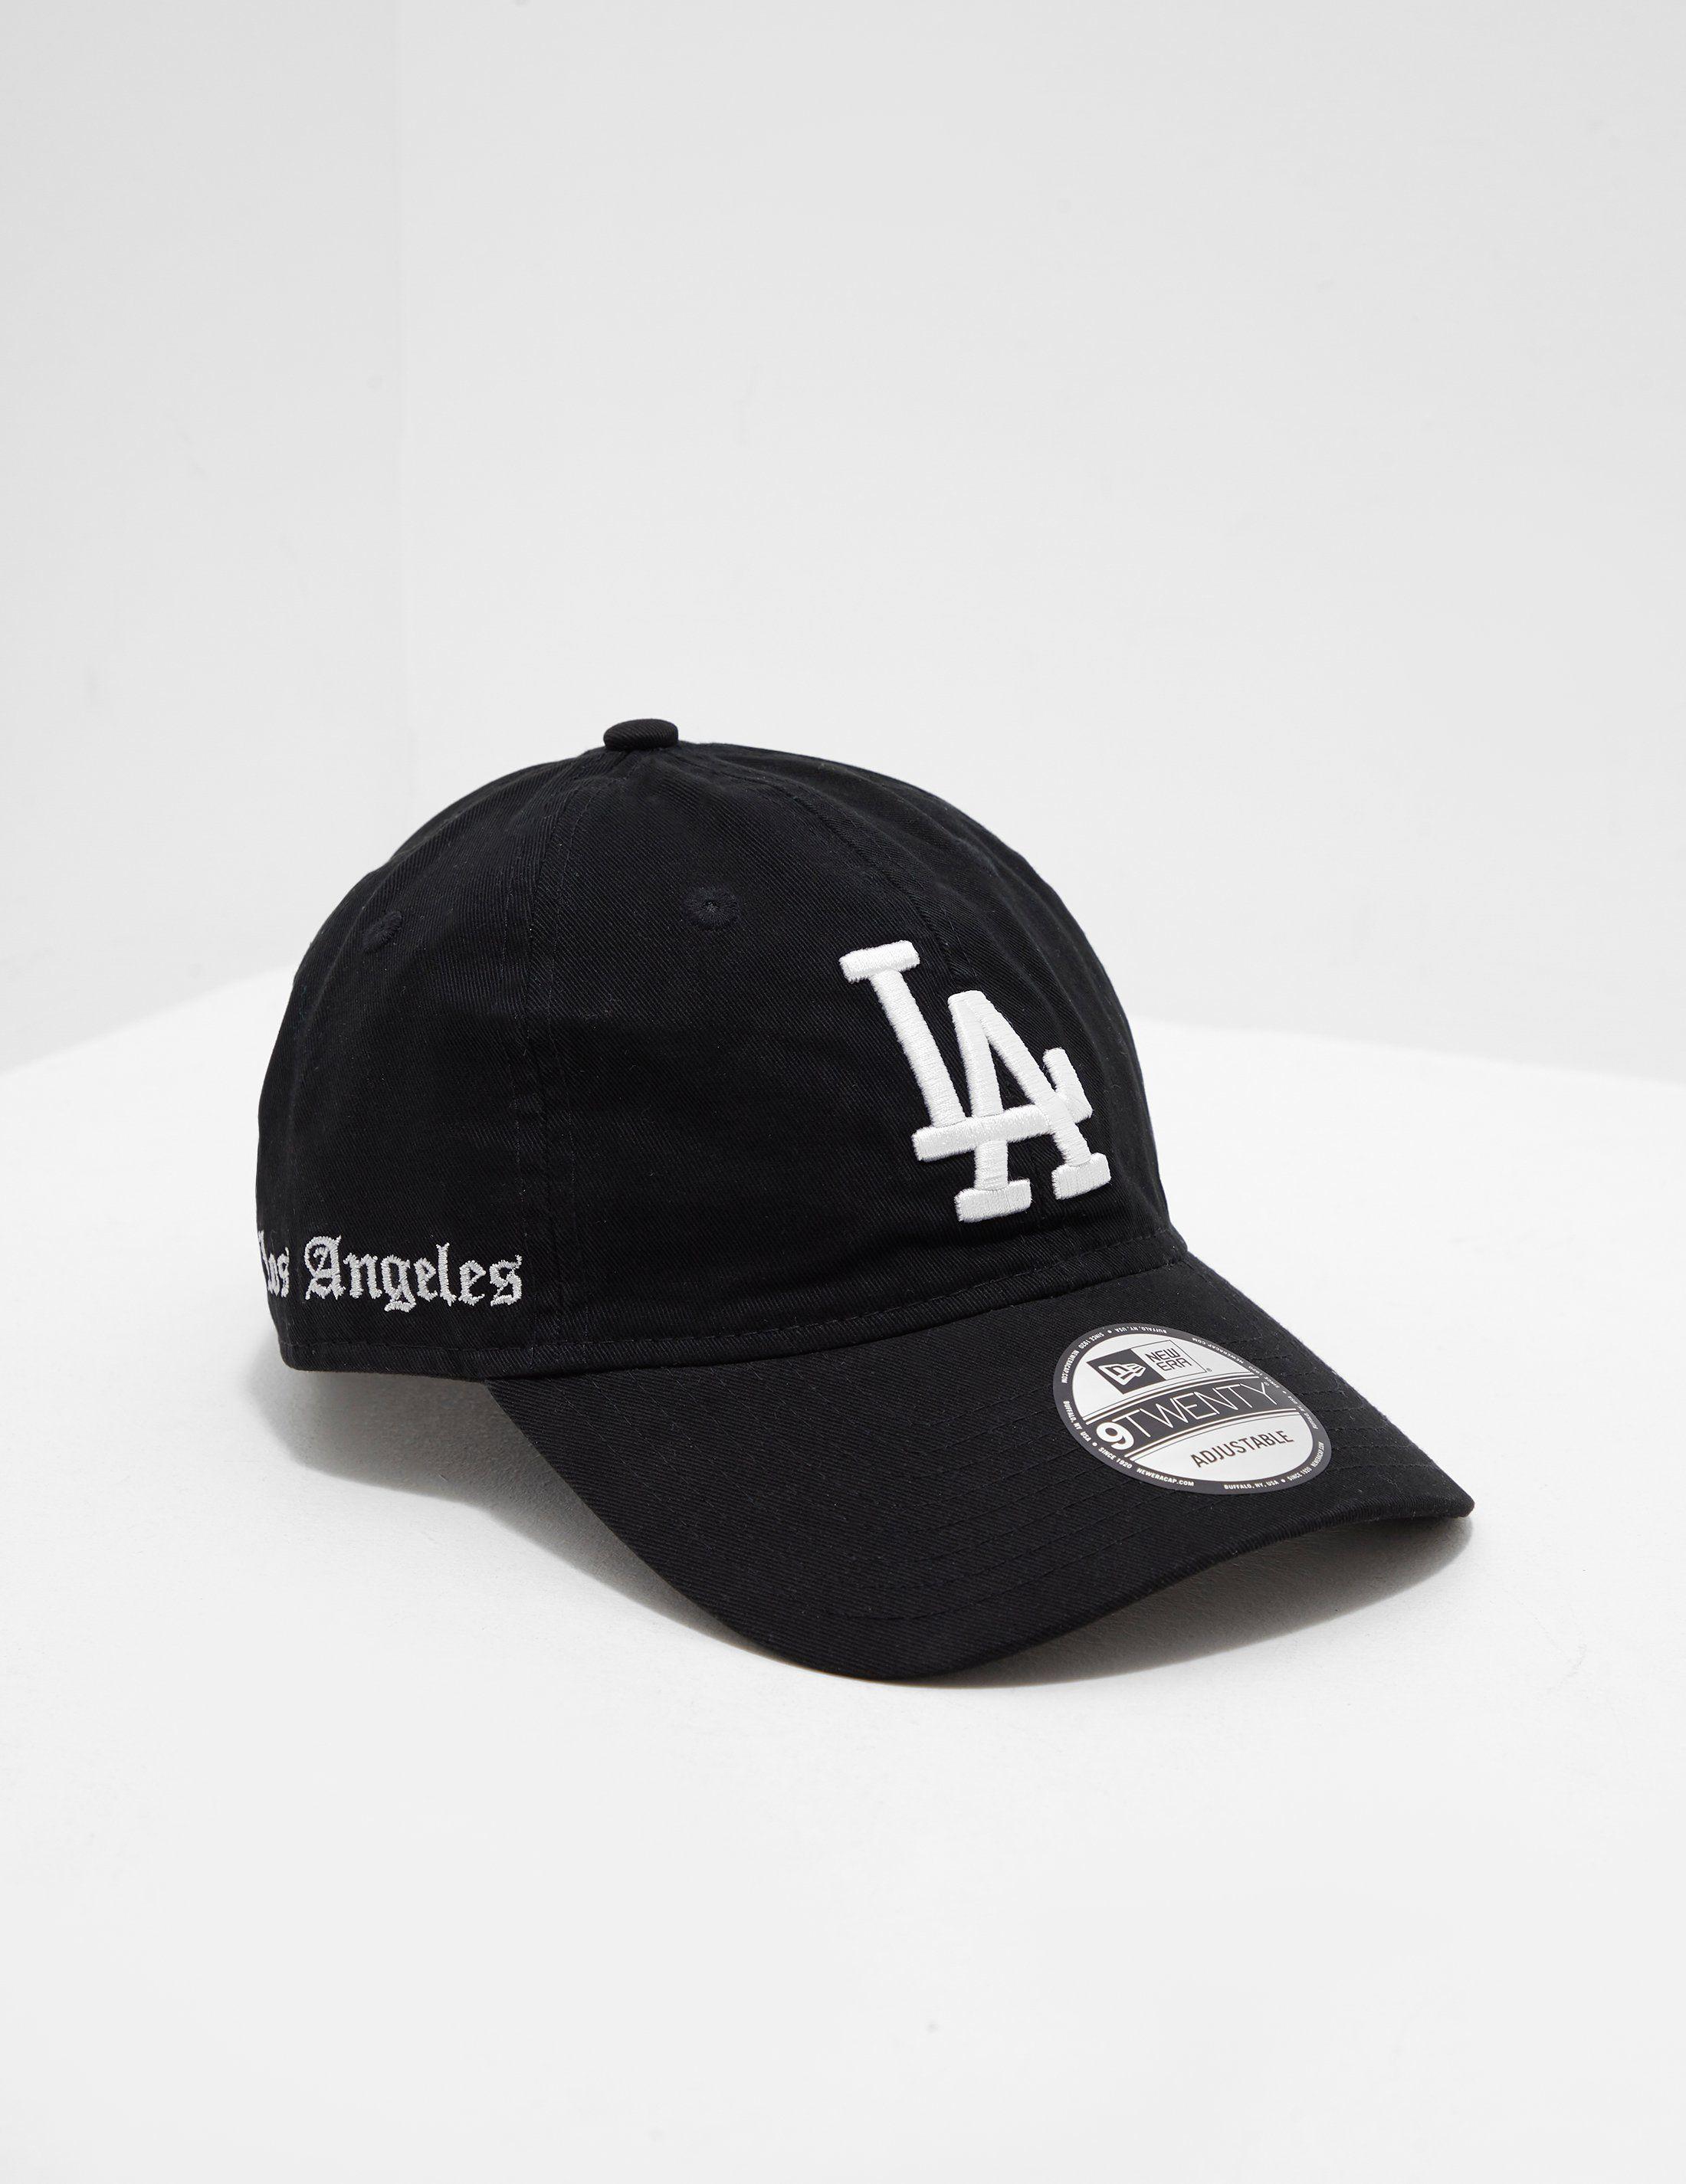 Marcelo Burlon LA Dodgers Cap - Online Exclusive